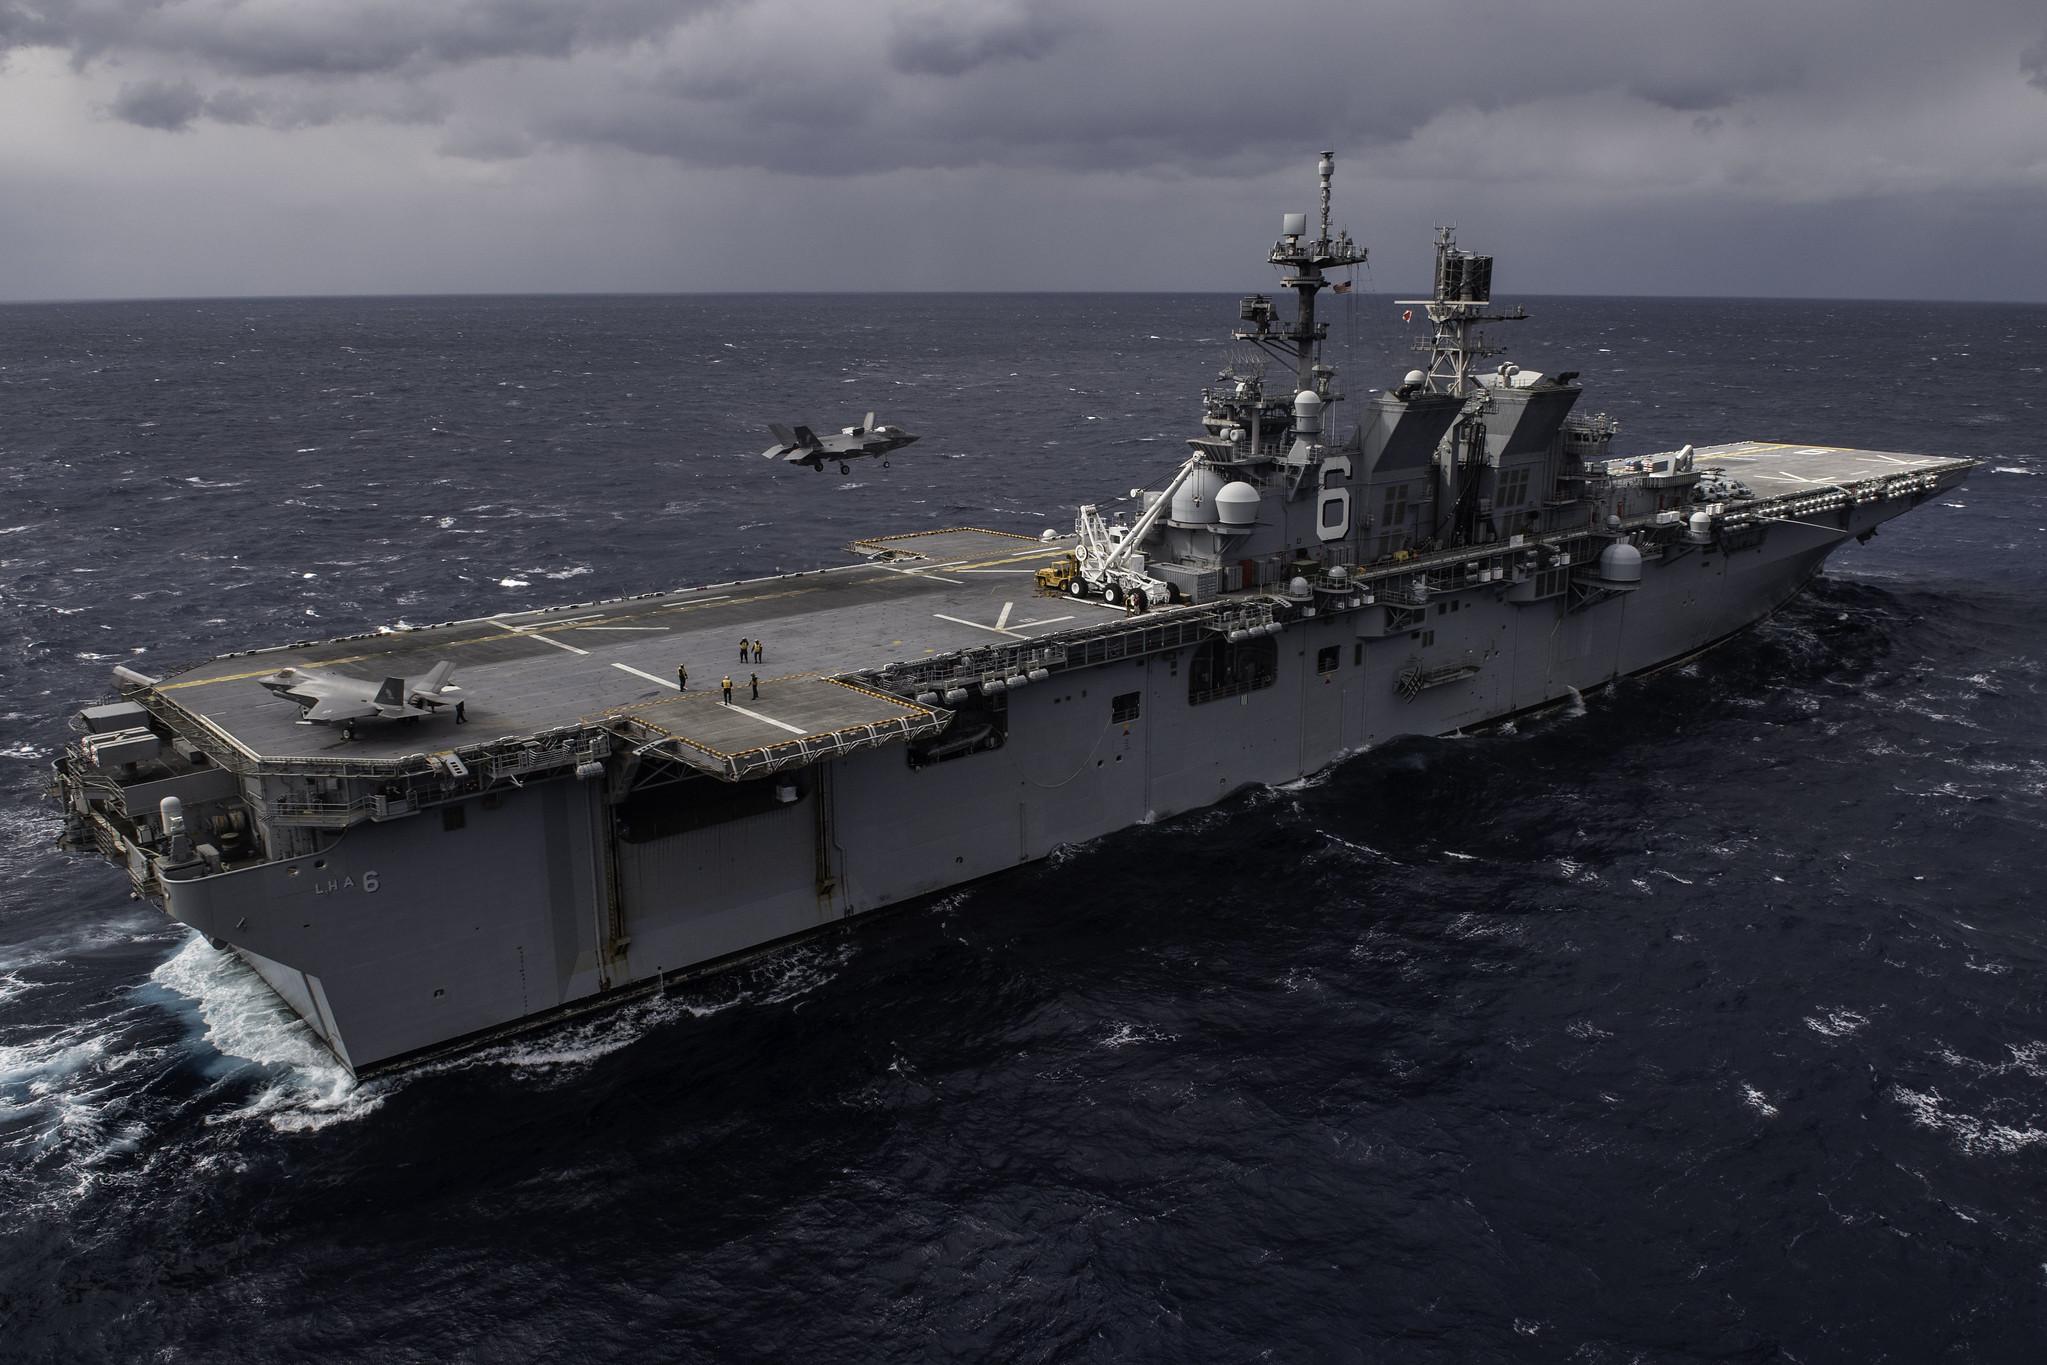 An F-35B Lightning II lands on the flight deck o the forward-deployed amphibious assault ship USS America (LHA 6) on Jan. 9, 2020, in the Philippine Sea. (Mass Communication Specialist Seaman Matthew Cavenaile/Navy)